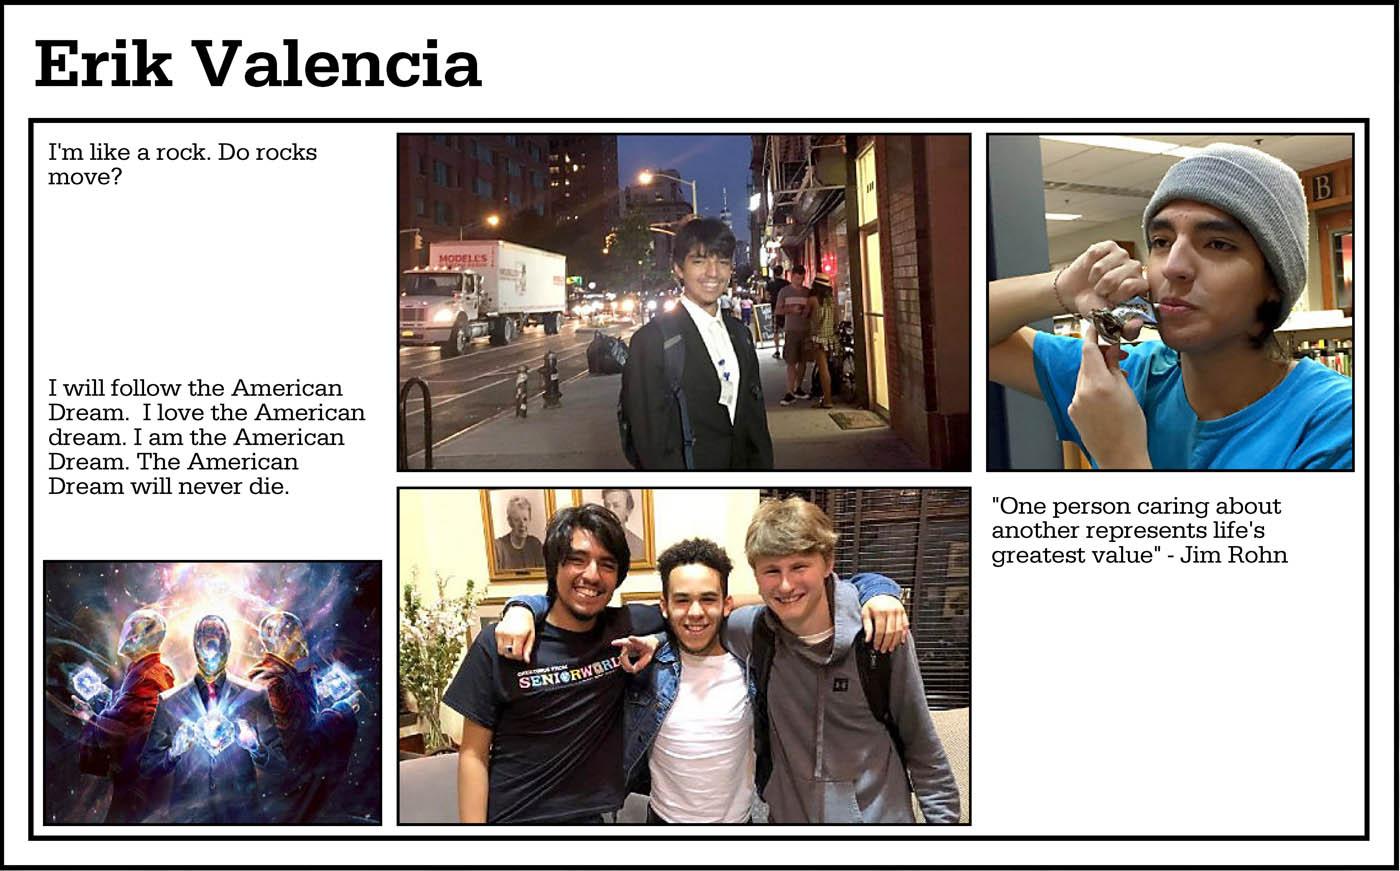 Valencia, Erik